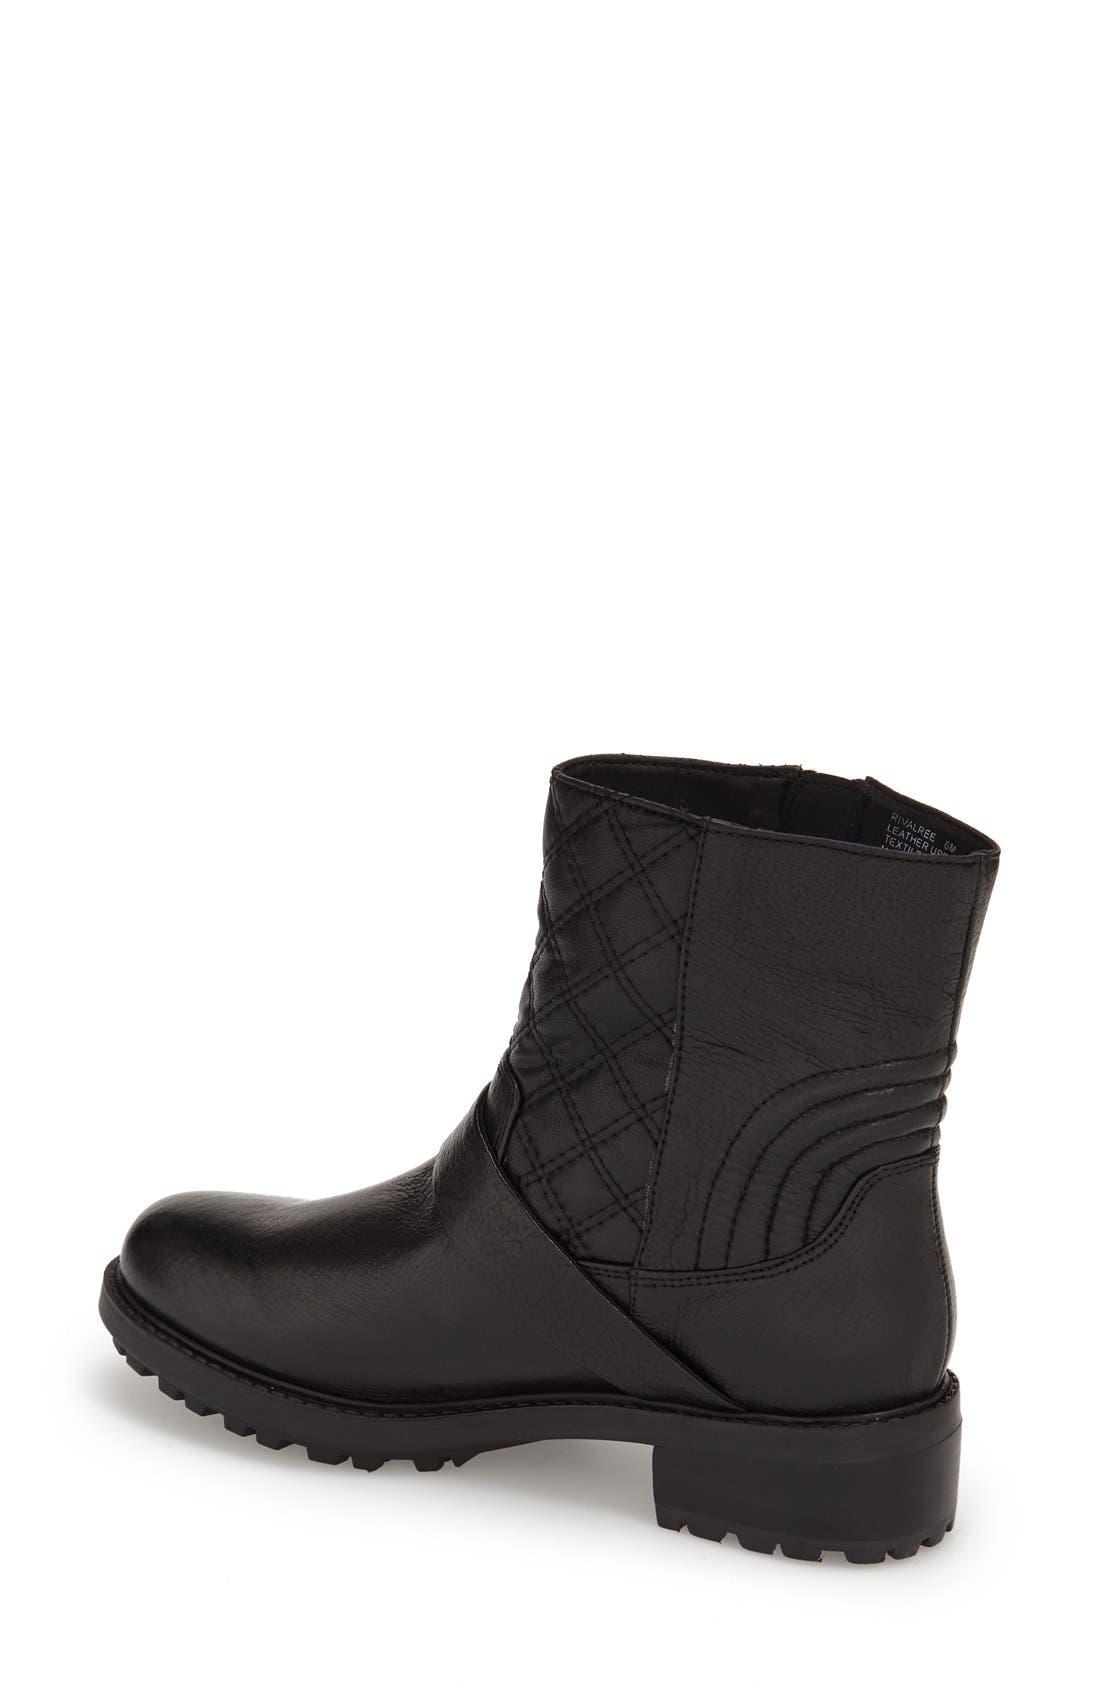 Alternate Image 2  - Steve Madden 'Rivalree' Moto Boot (Women) (Special Purchase)